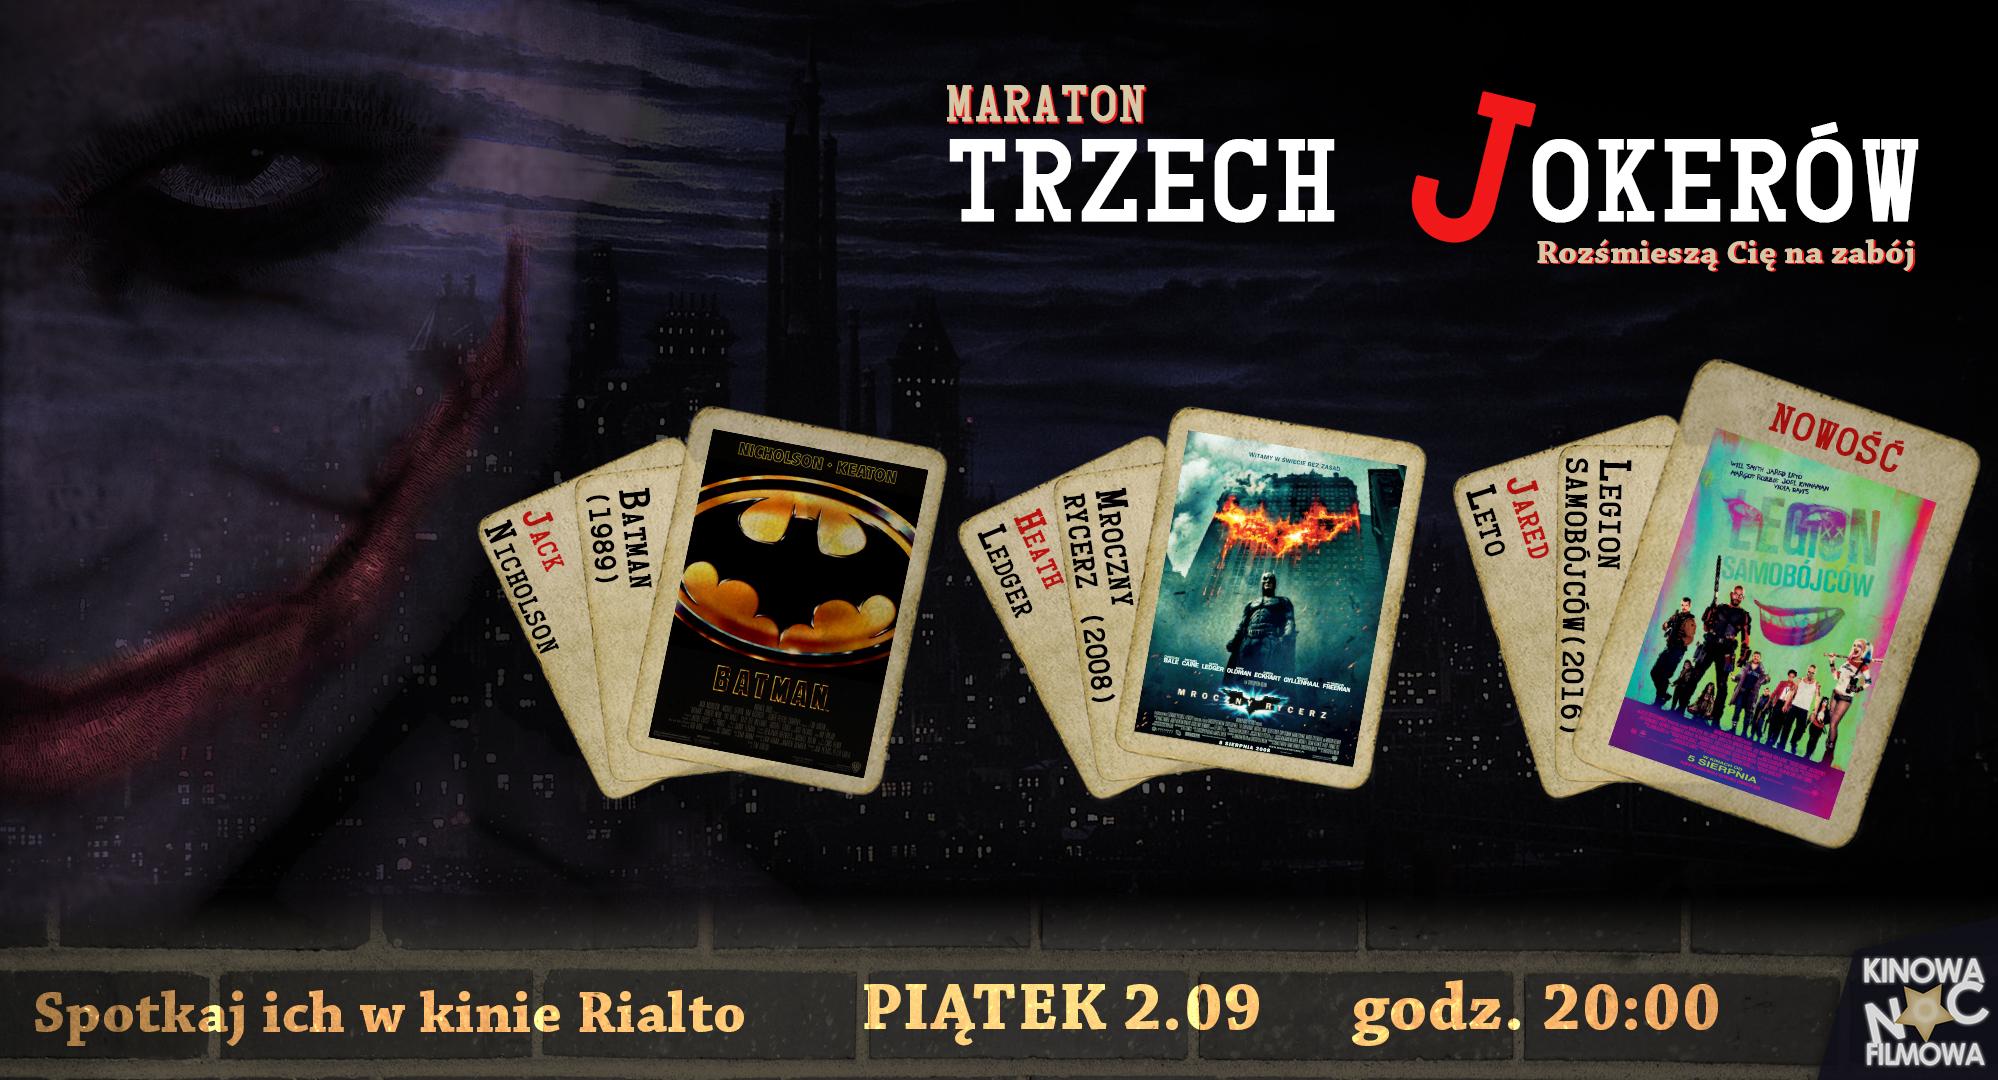 Rialto Trzech jokerow - grafika